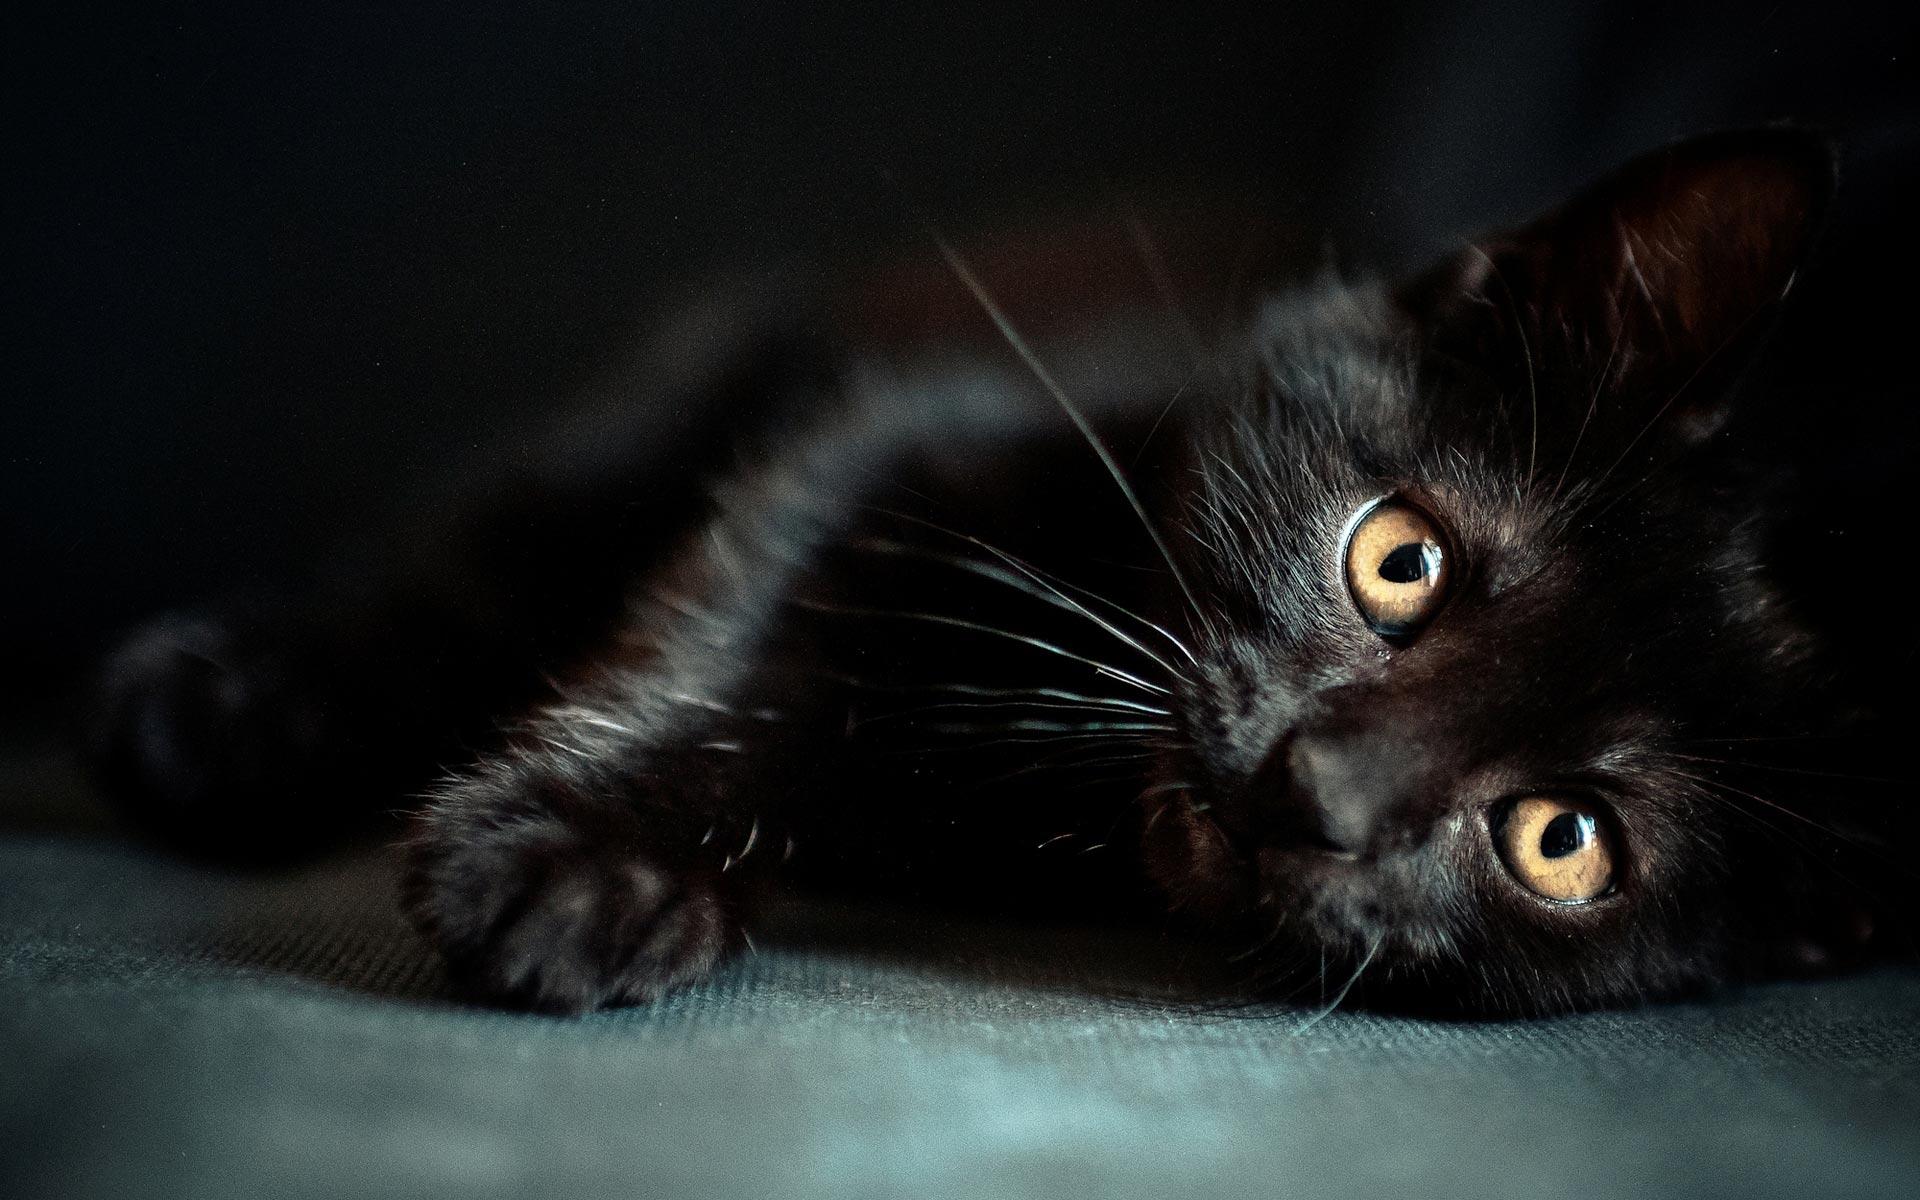 Beautiful Black Cat Cats Wallpaper 41243073 Fanpop Page 3